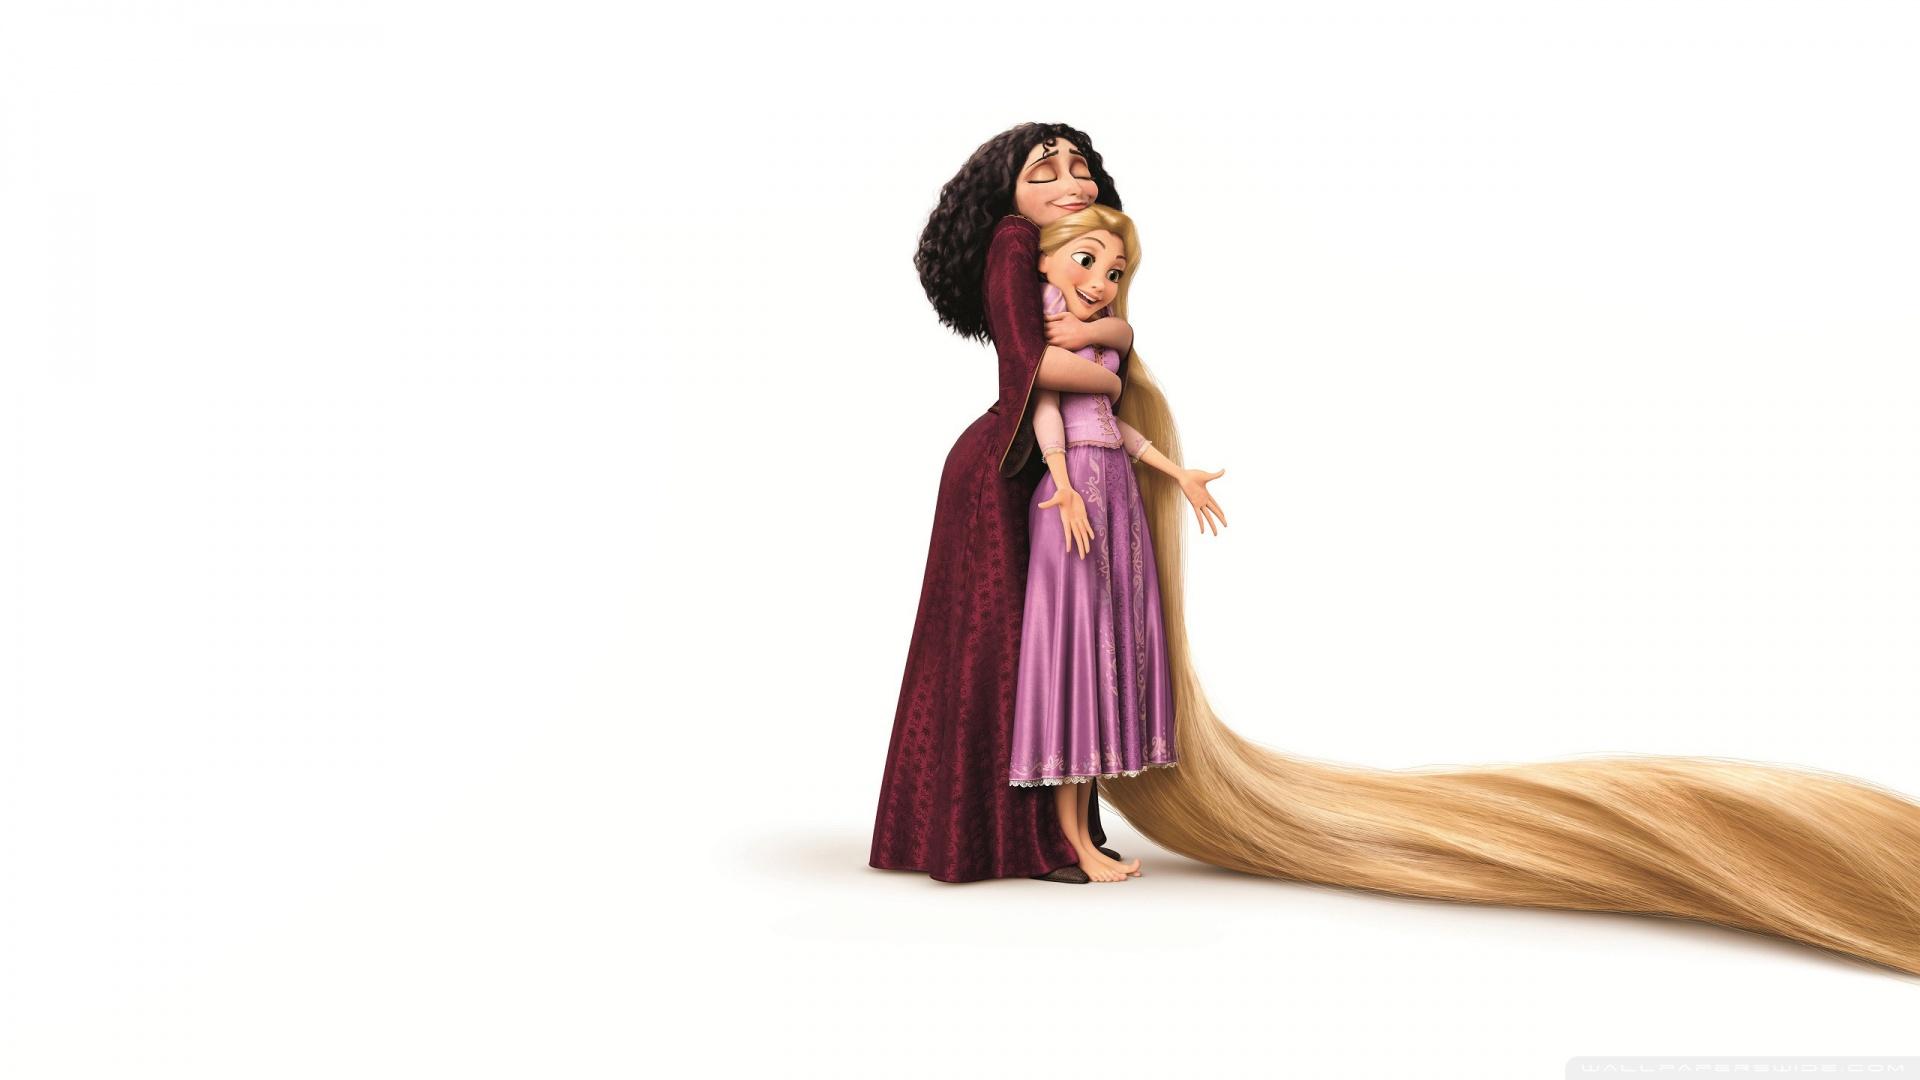 Wallpaper iphone rapunzel - Tangled Rapunzel Wallpaper